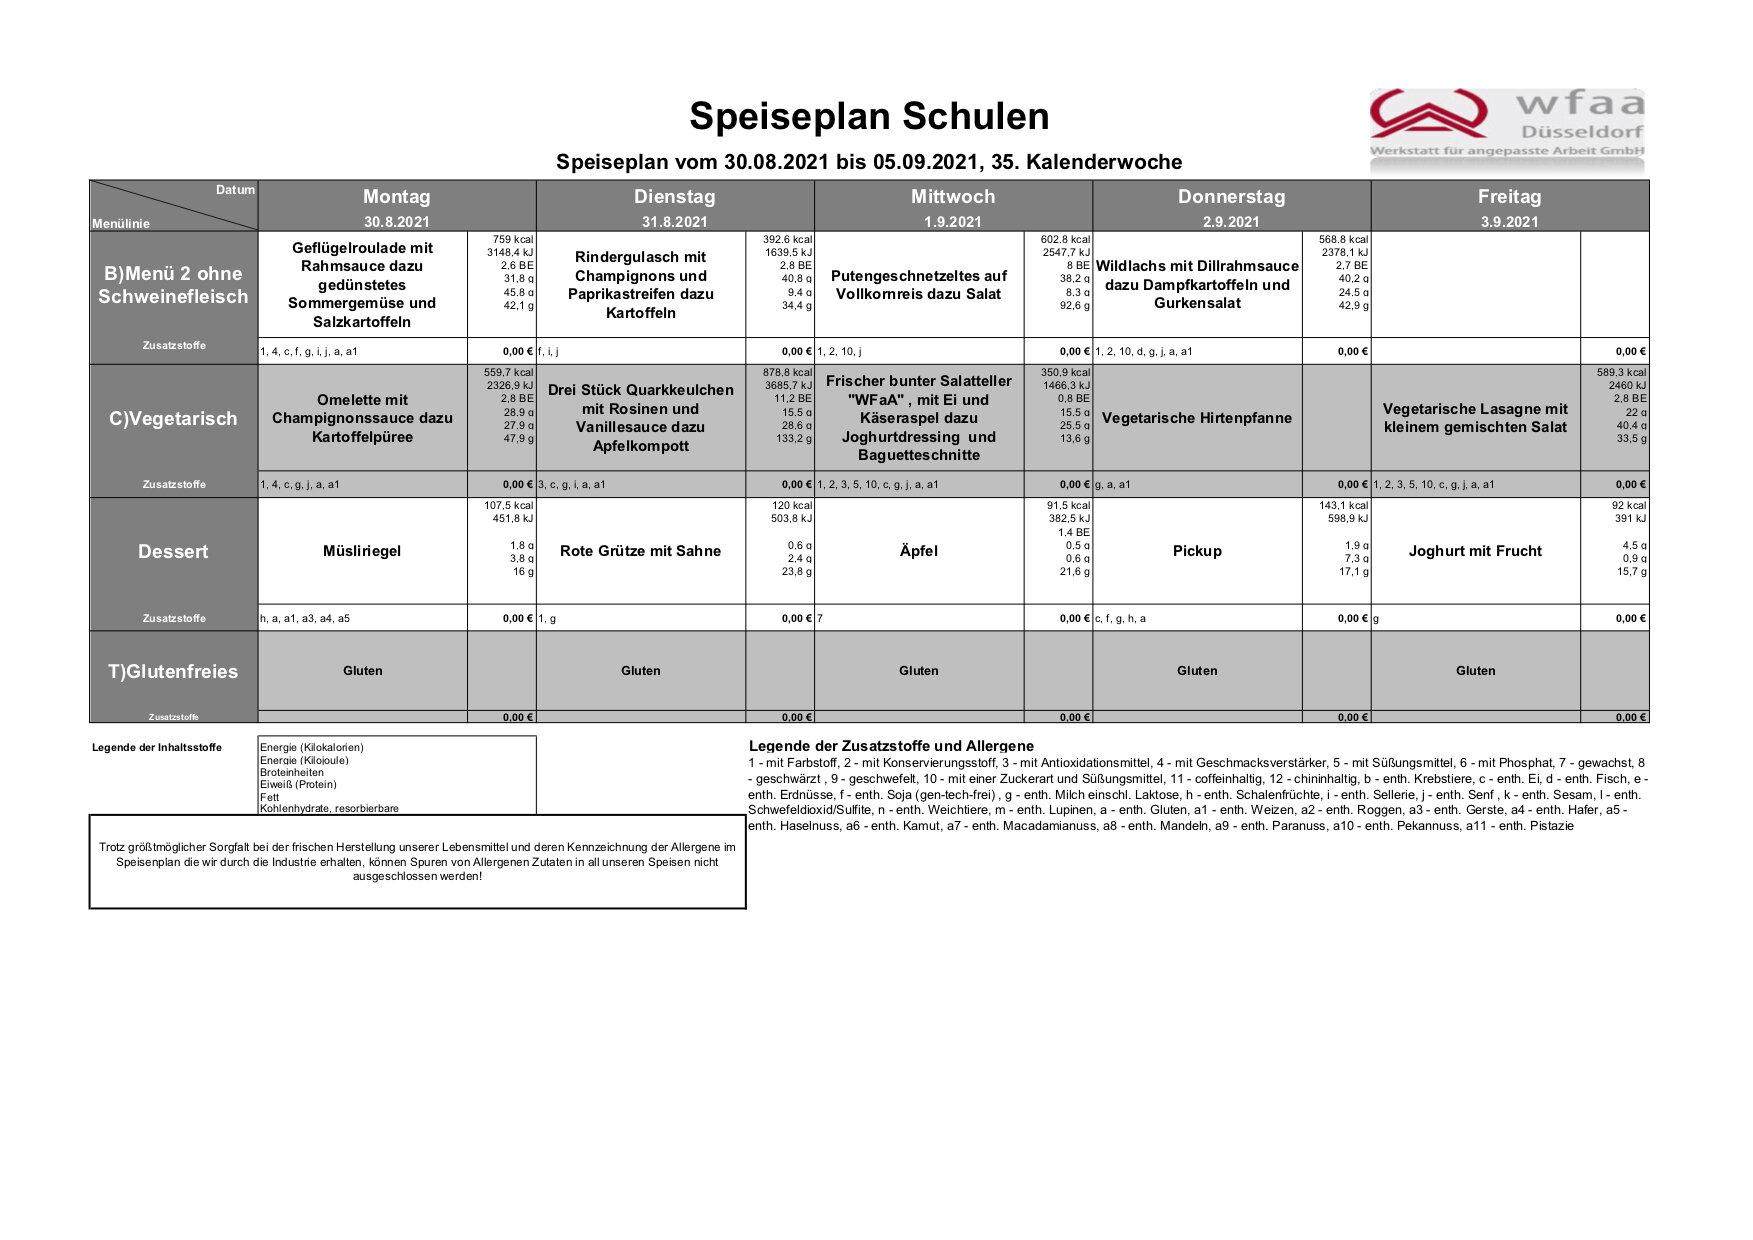 Speiseplan 30. - 05.09.2021 (KW 35)